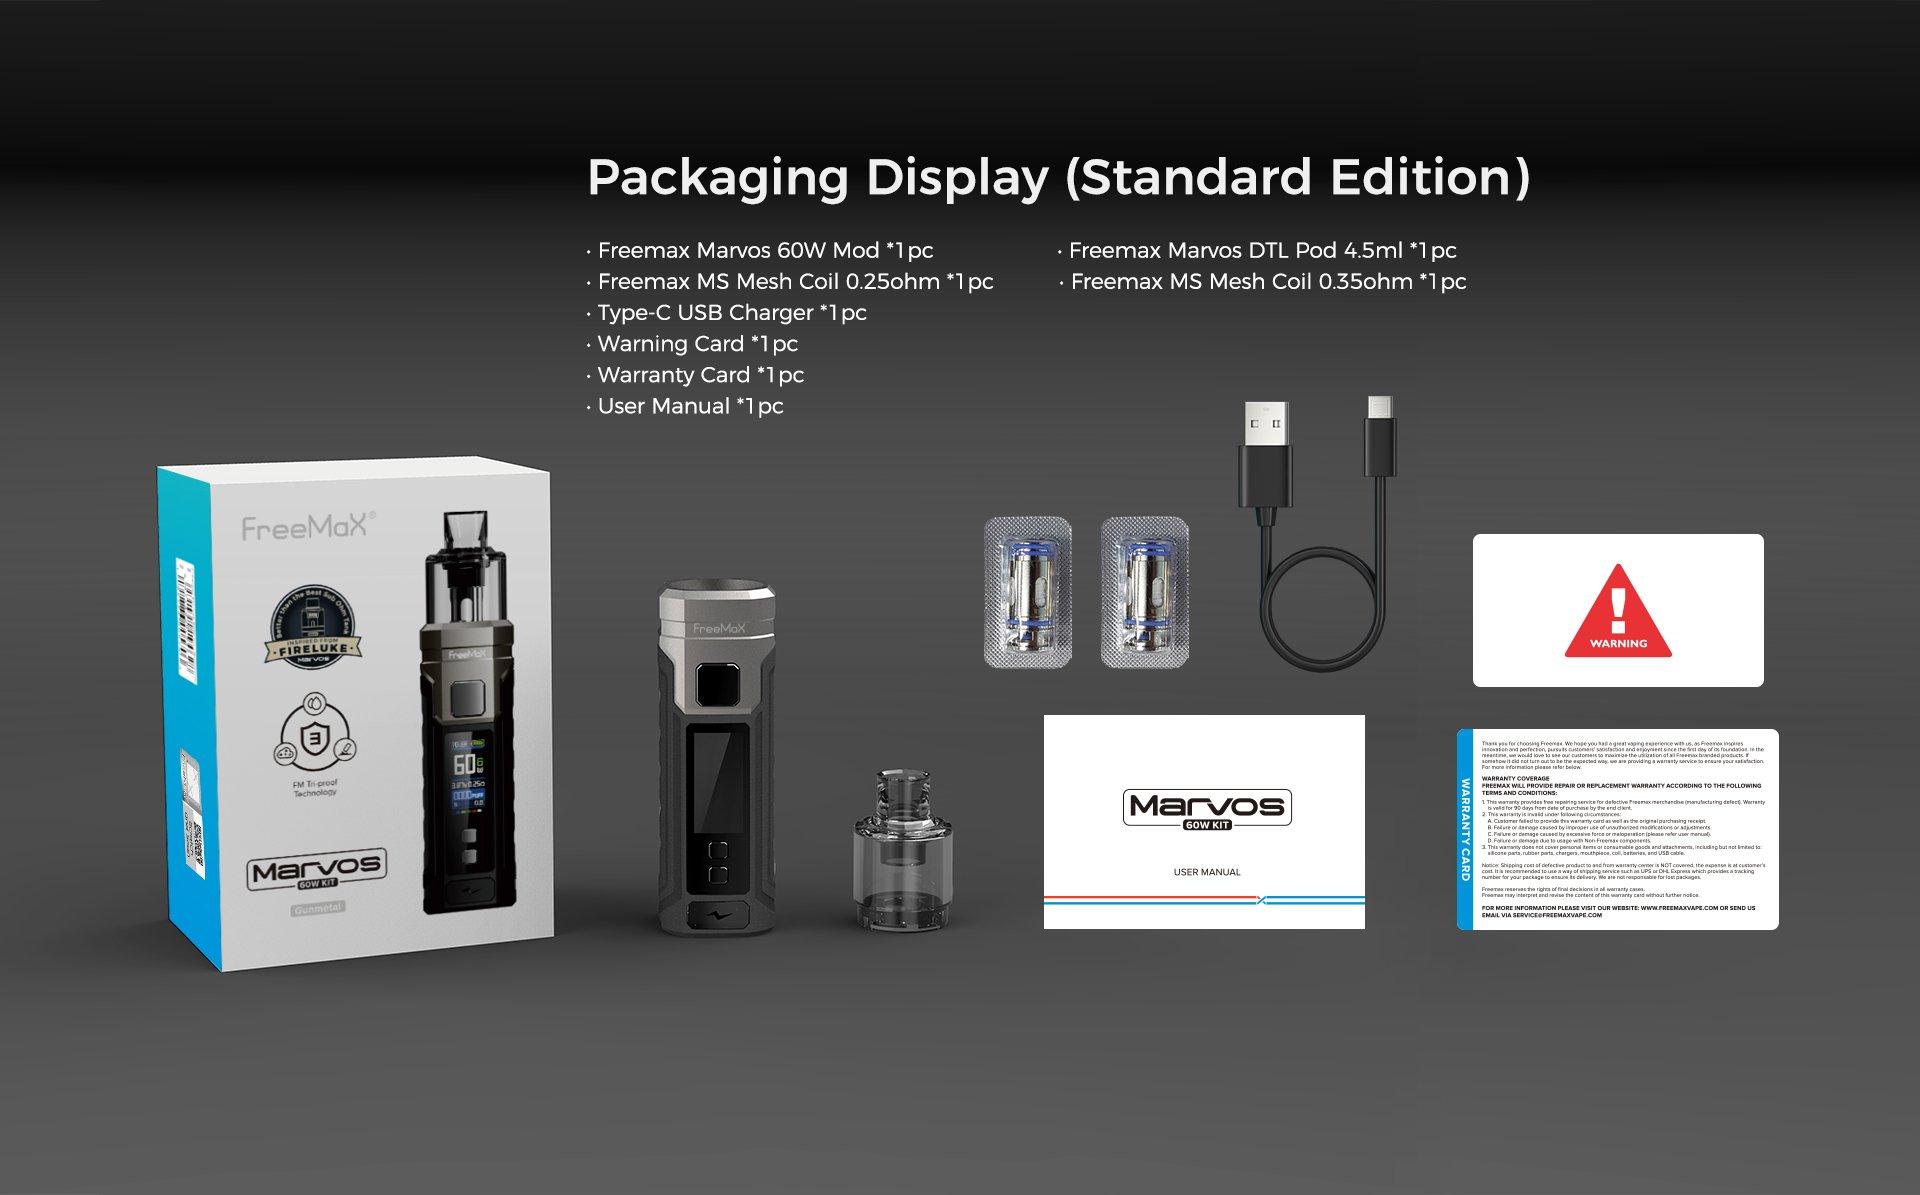 Marvos 60W Kit -packaging-display-standard-edition